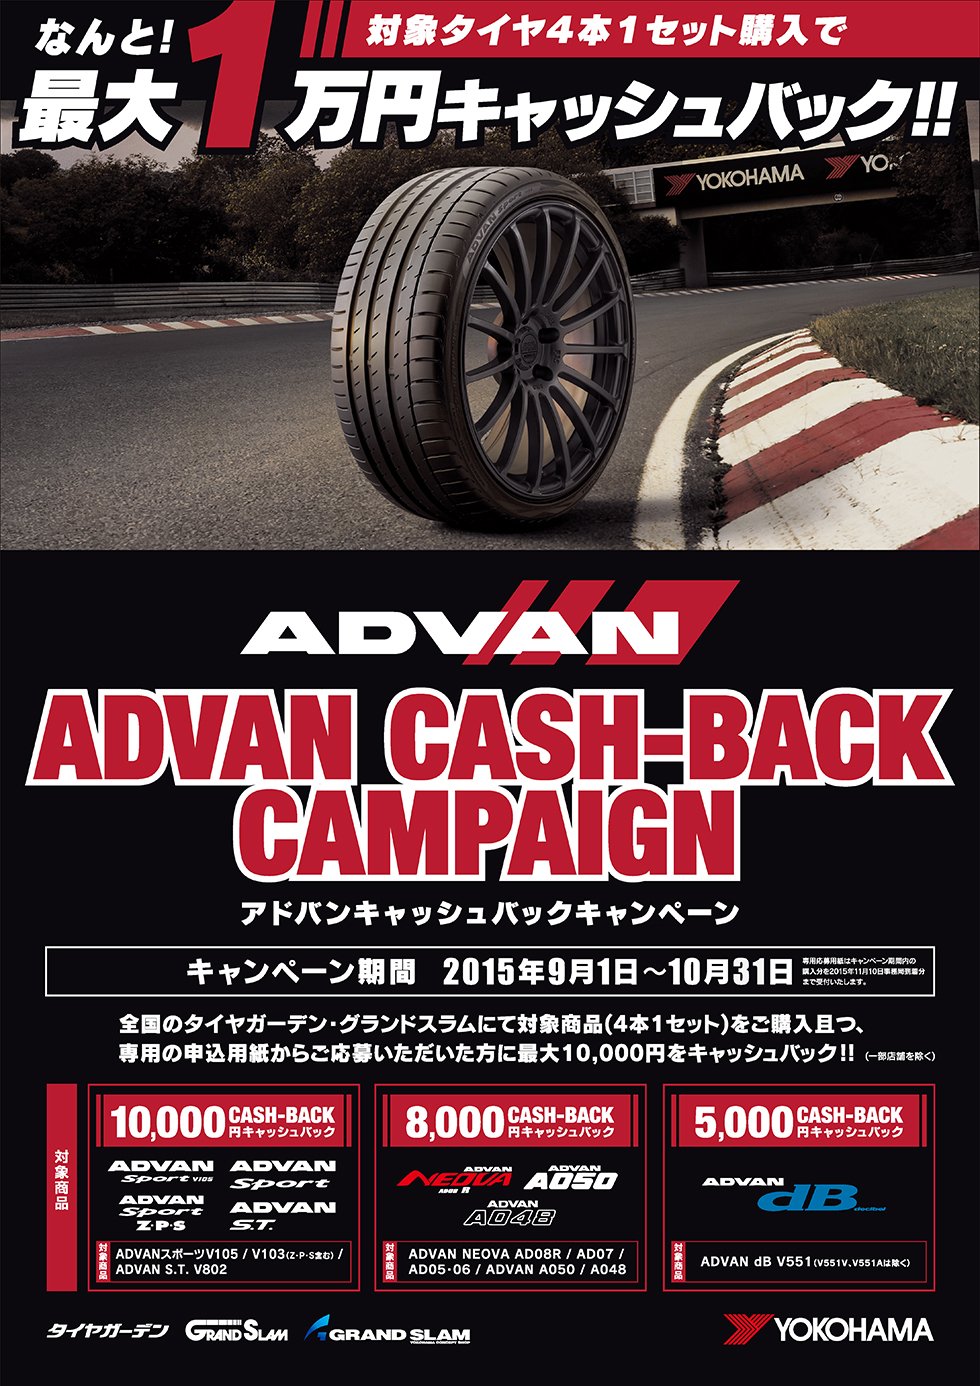 cashback2015_autumn (1)